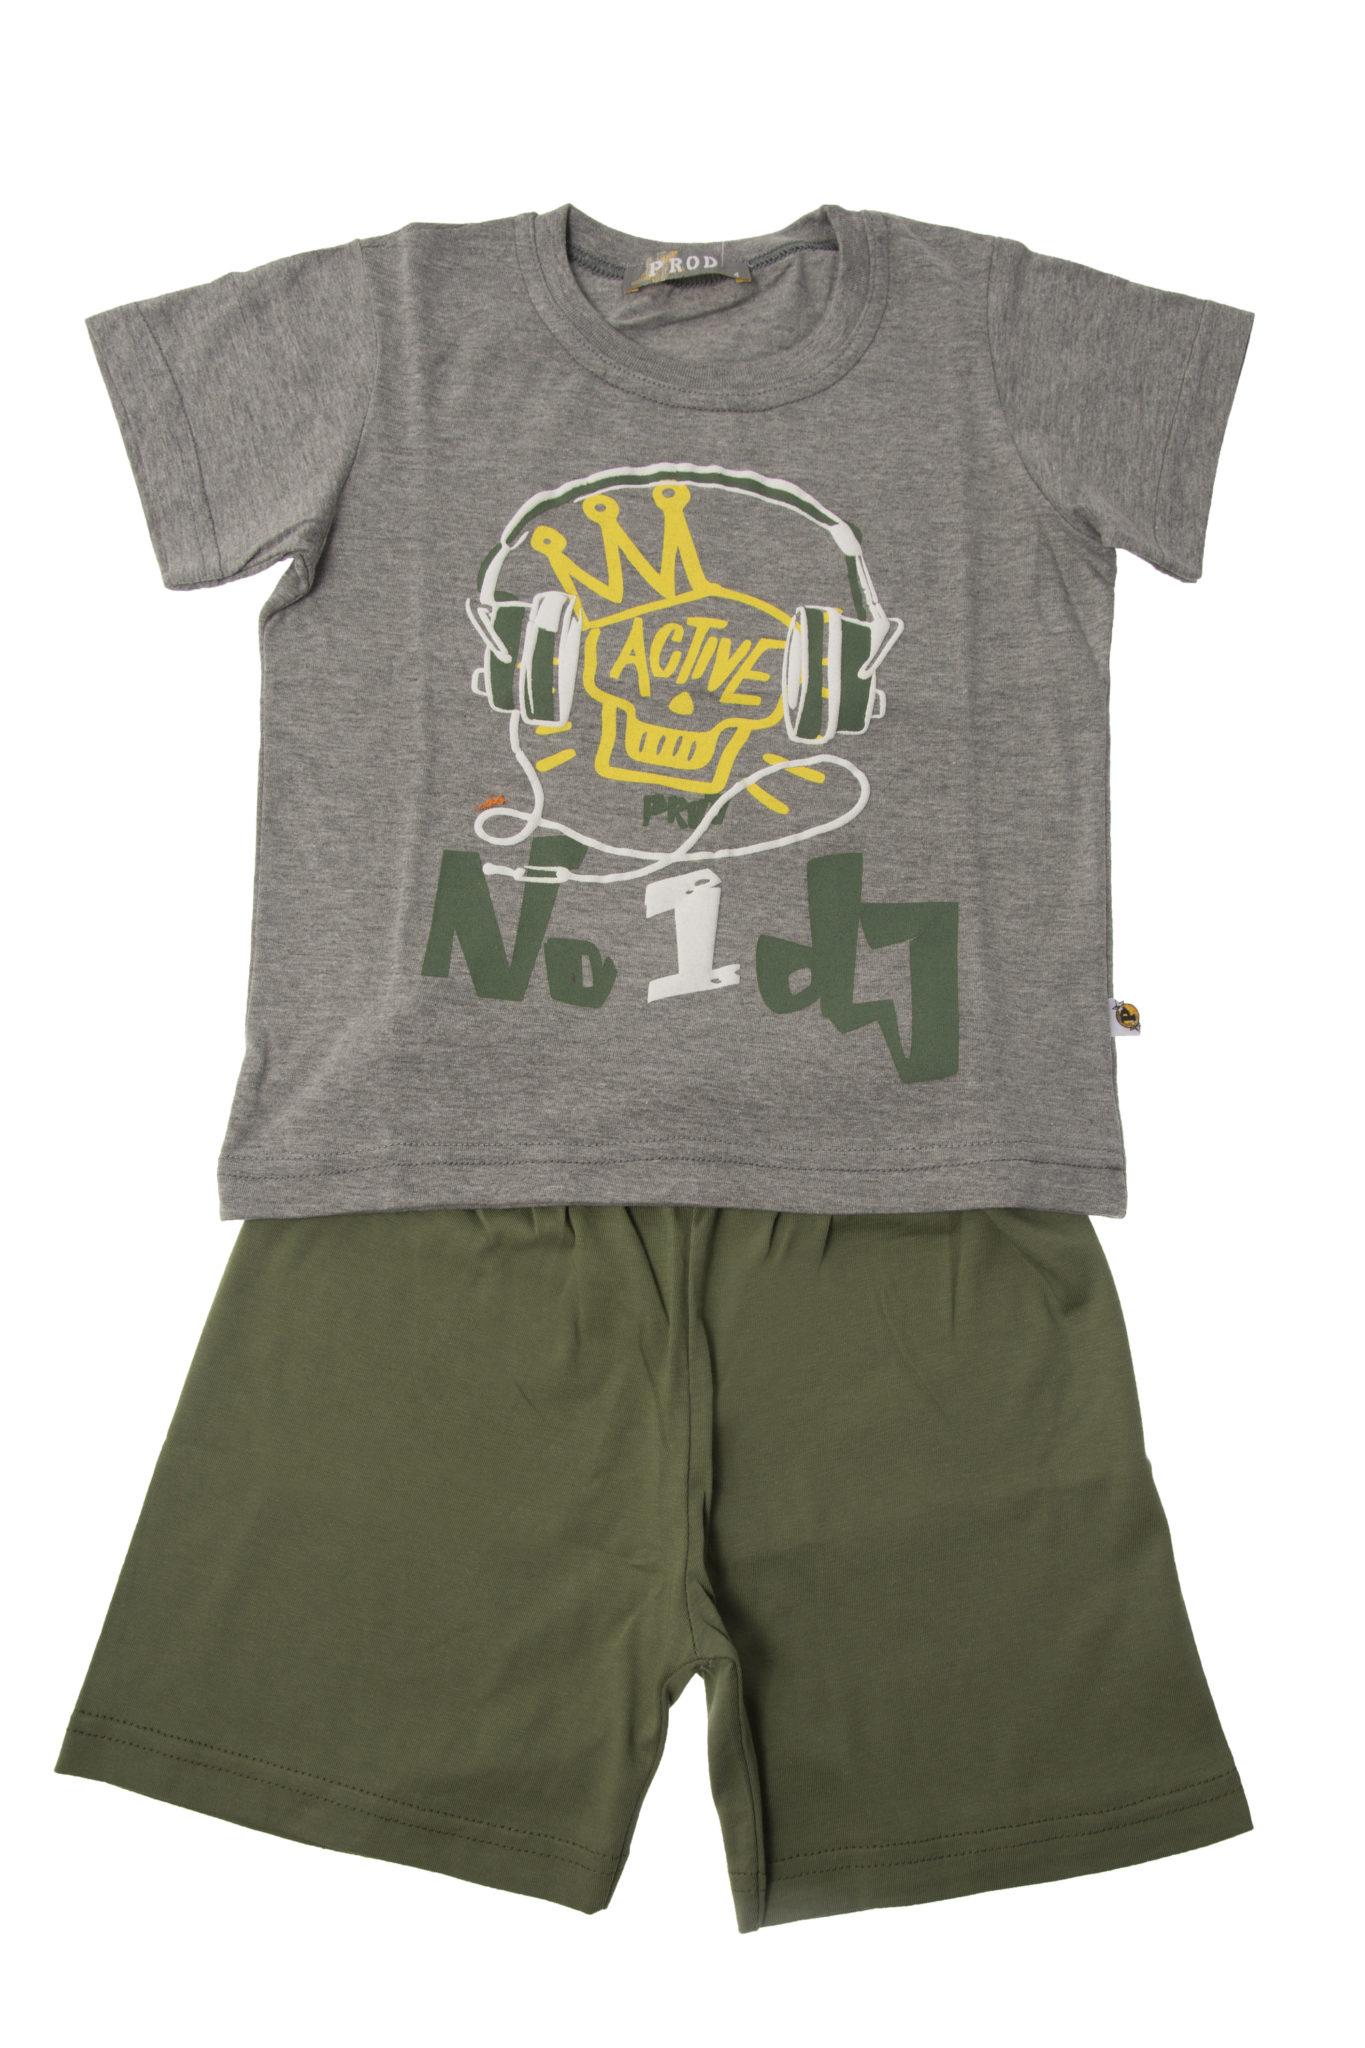 b123606c721 Σετ ρούχων για αγόρι «No1 Dj» - Baby 03